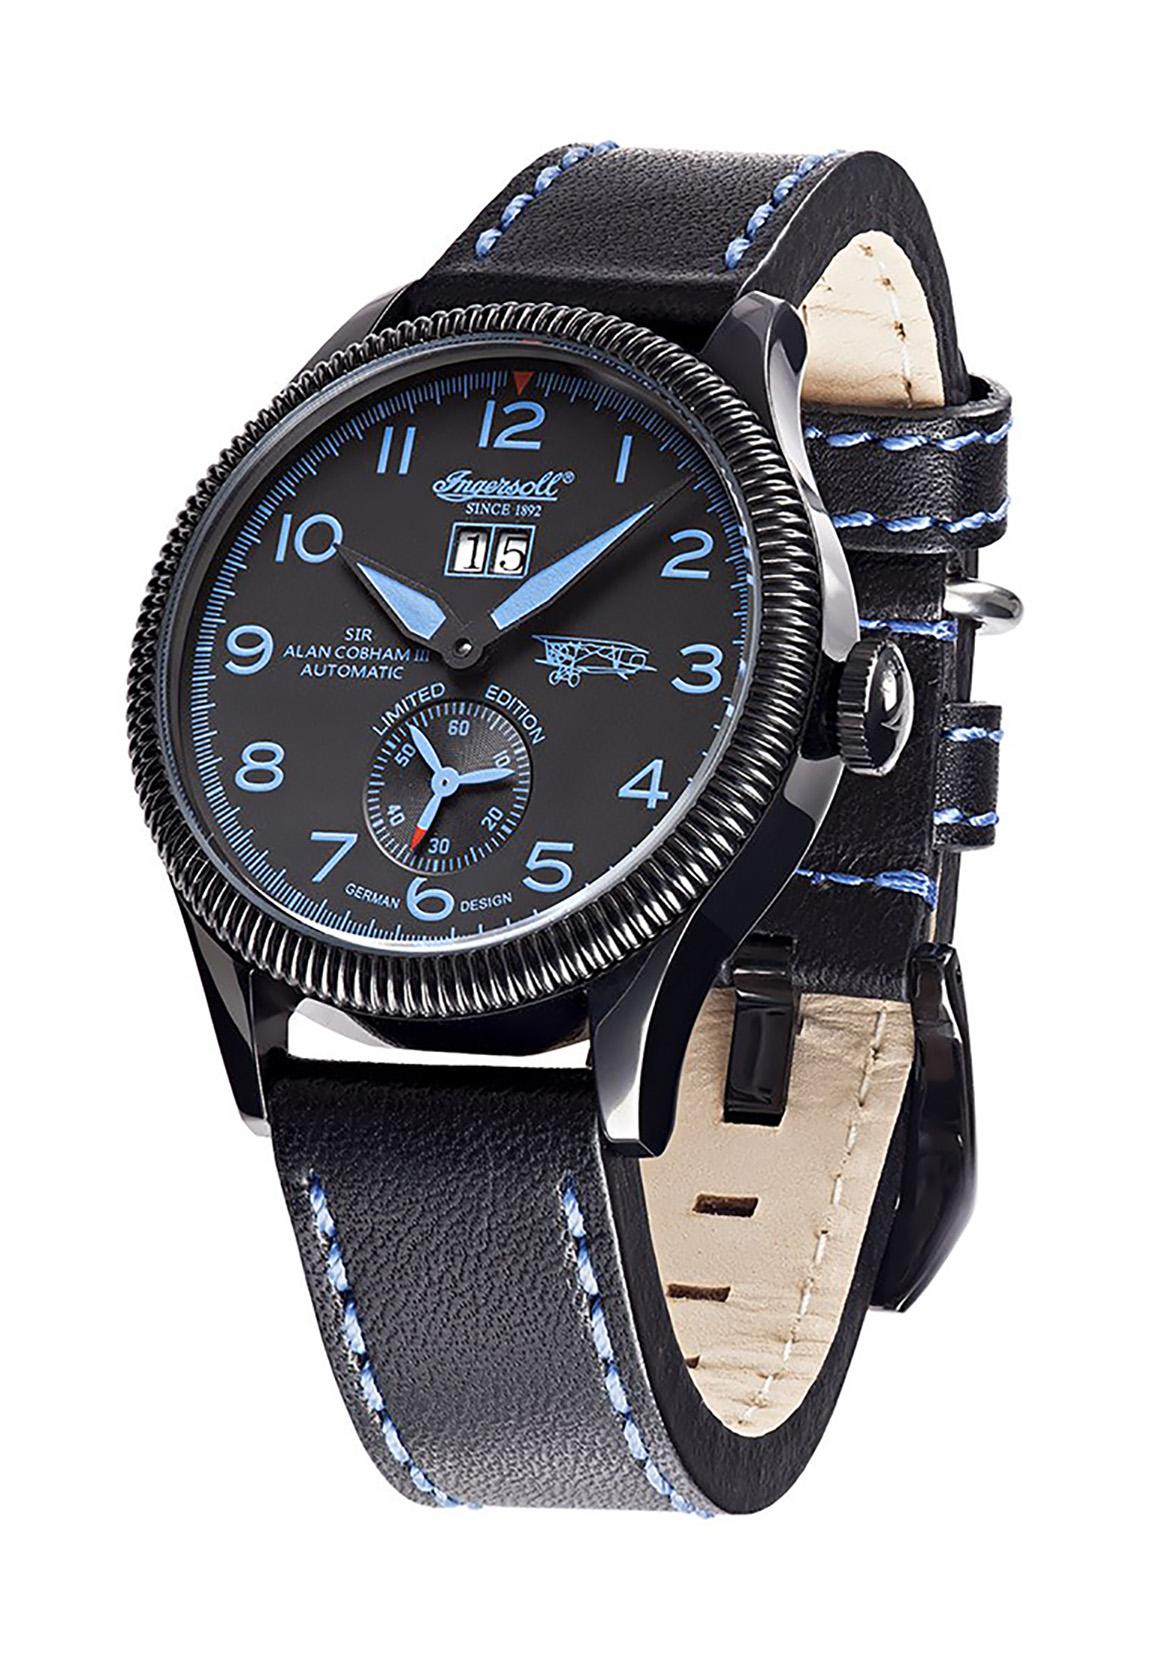 Ingersoll Armbanduhr SIR ALAN COBHAM III IN3108BBKB